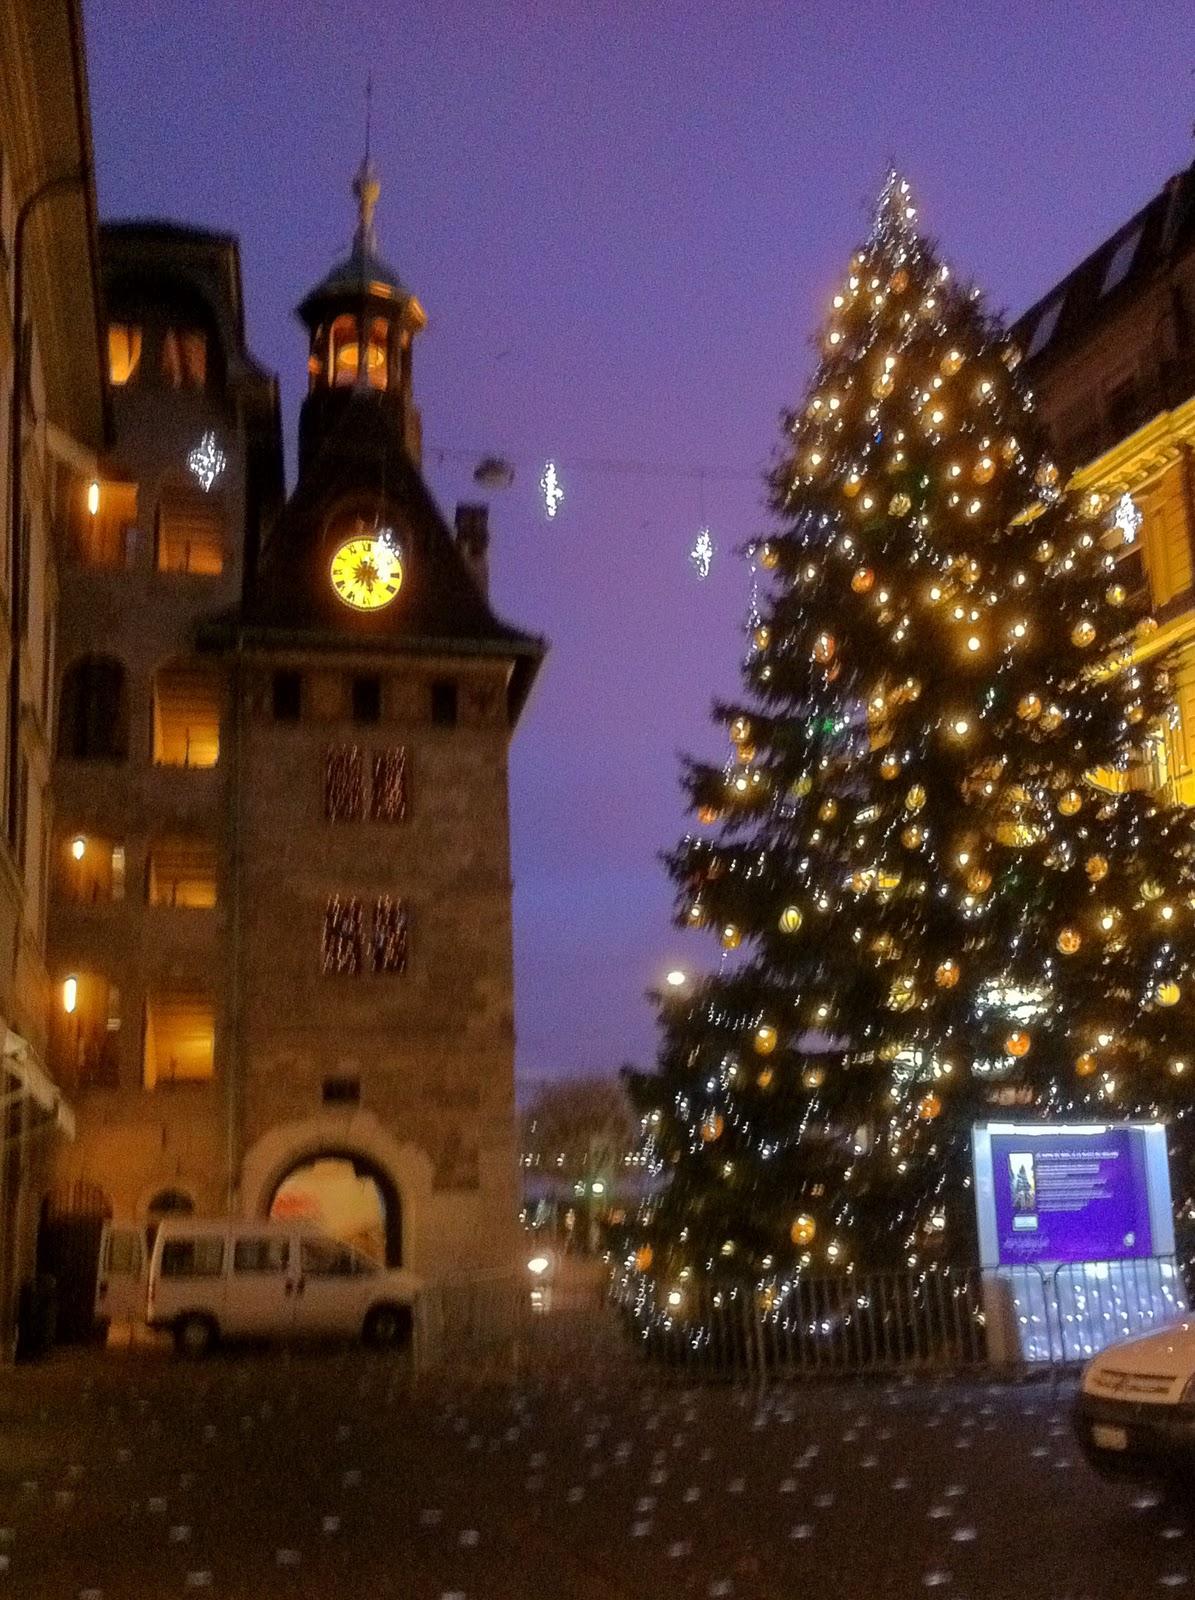 #AD731E Christmas Tree Schwingeninswitzerland 5545 decorations noel geneve 1195x1600 px @ aertt.com